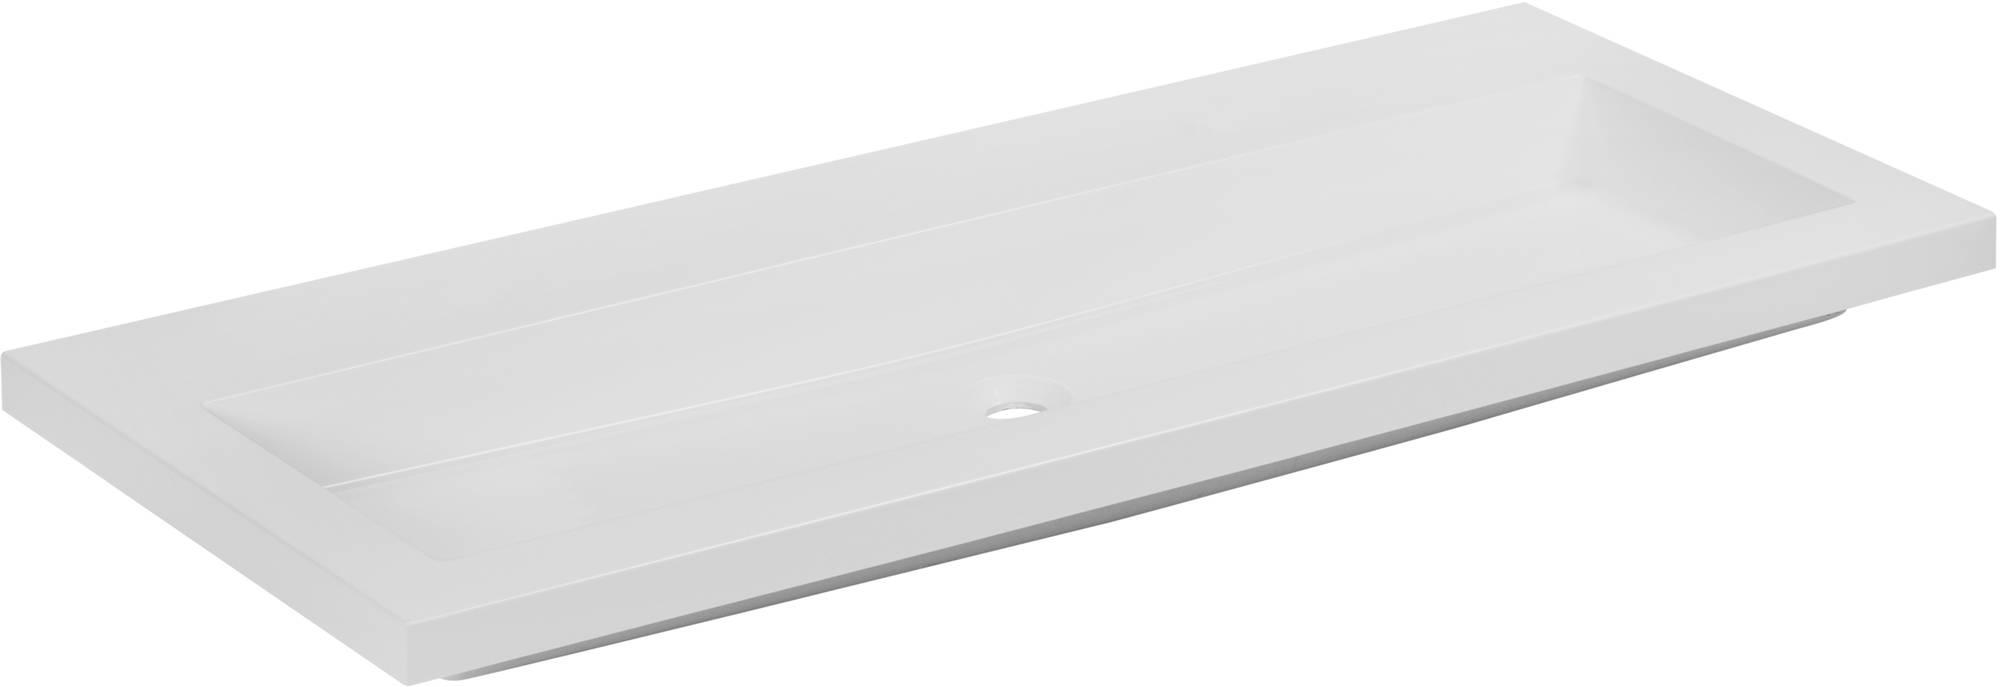 Ben Straight Wastafel zonder kraangat 120x51 cm Wit